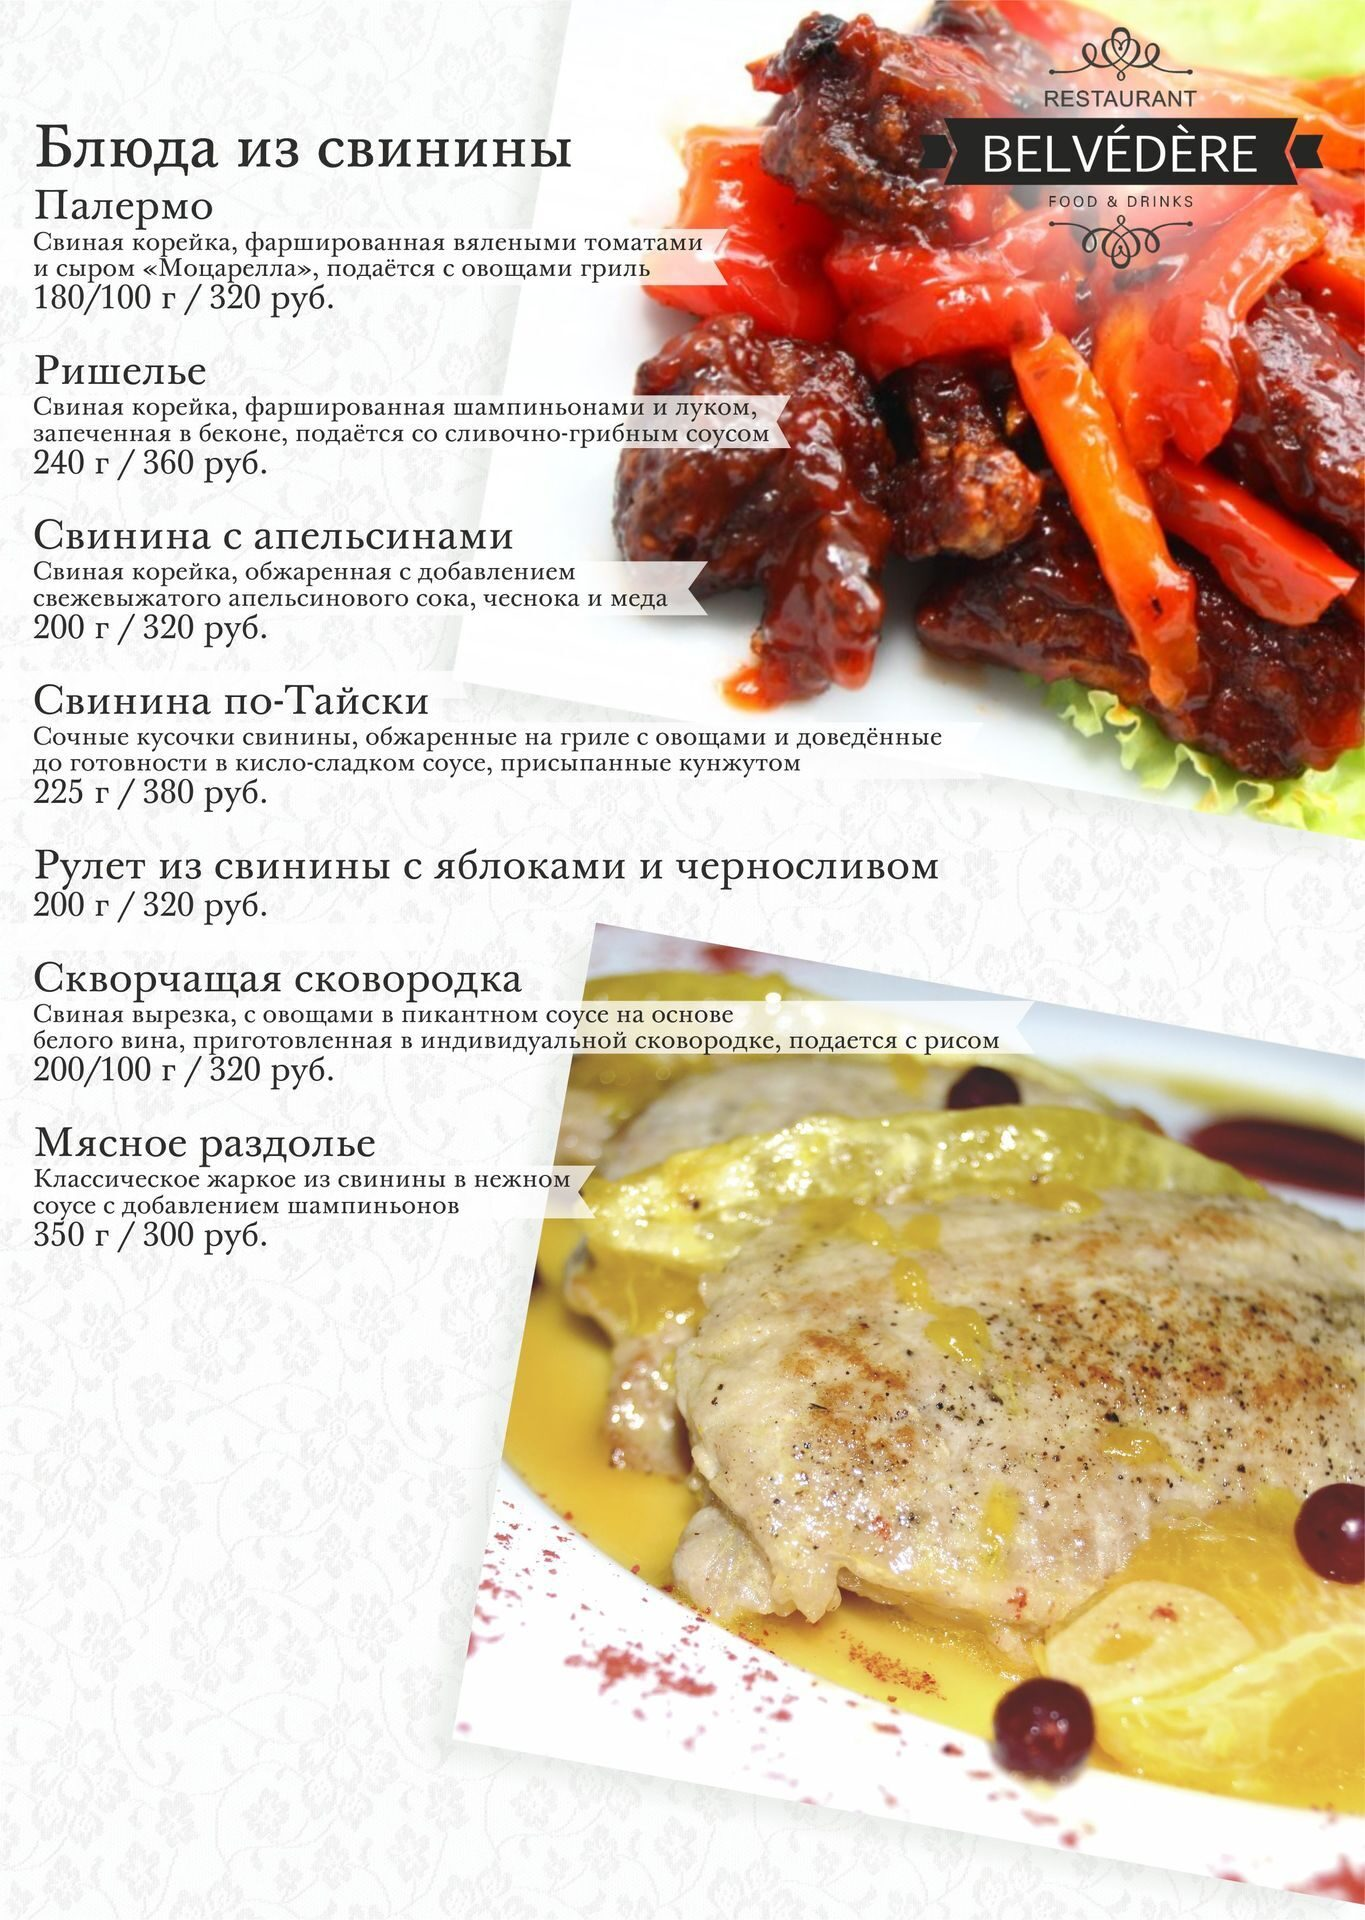 Свинина кусочками с черносливом рецепт 13